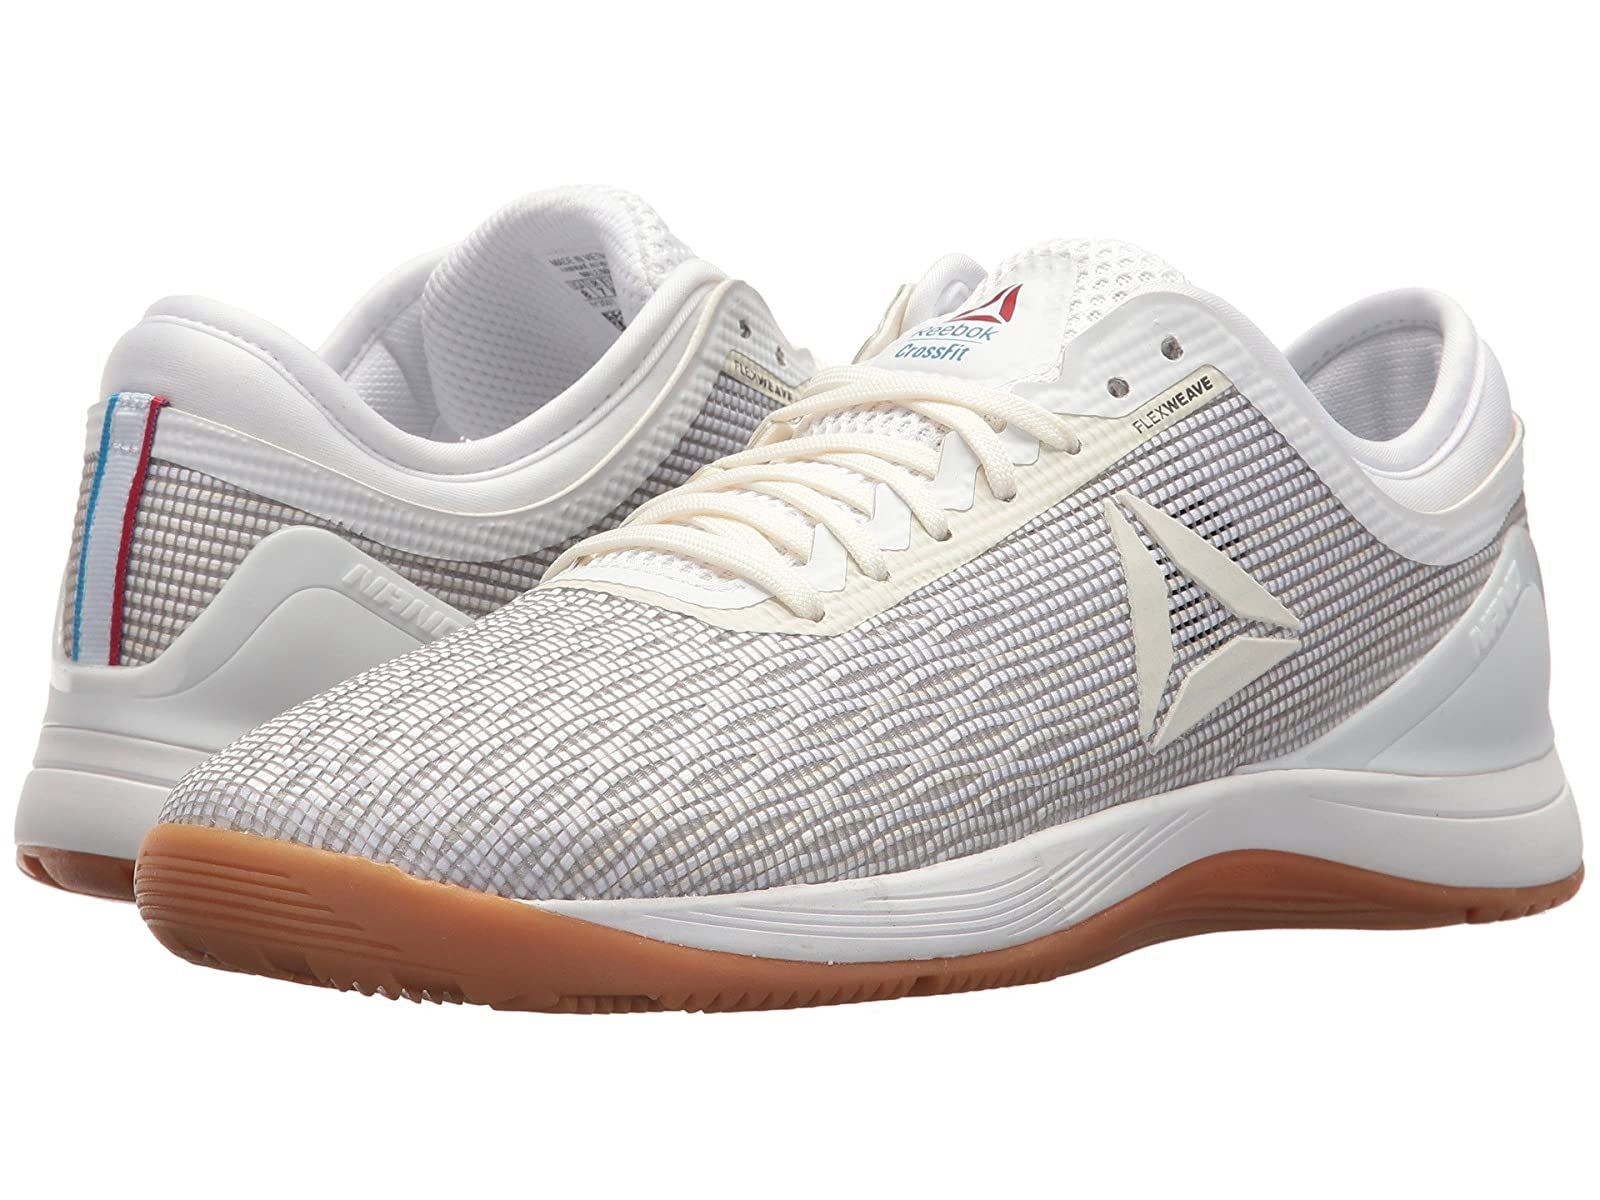 Reebok CrossFit® Nano 8.0Atmospheric grades have affordable shoes